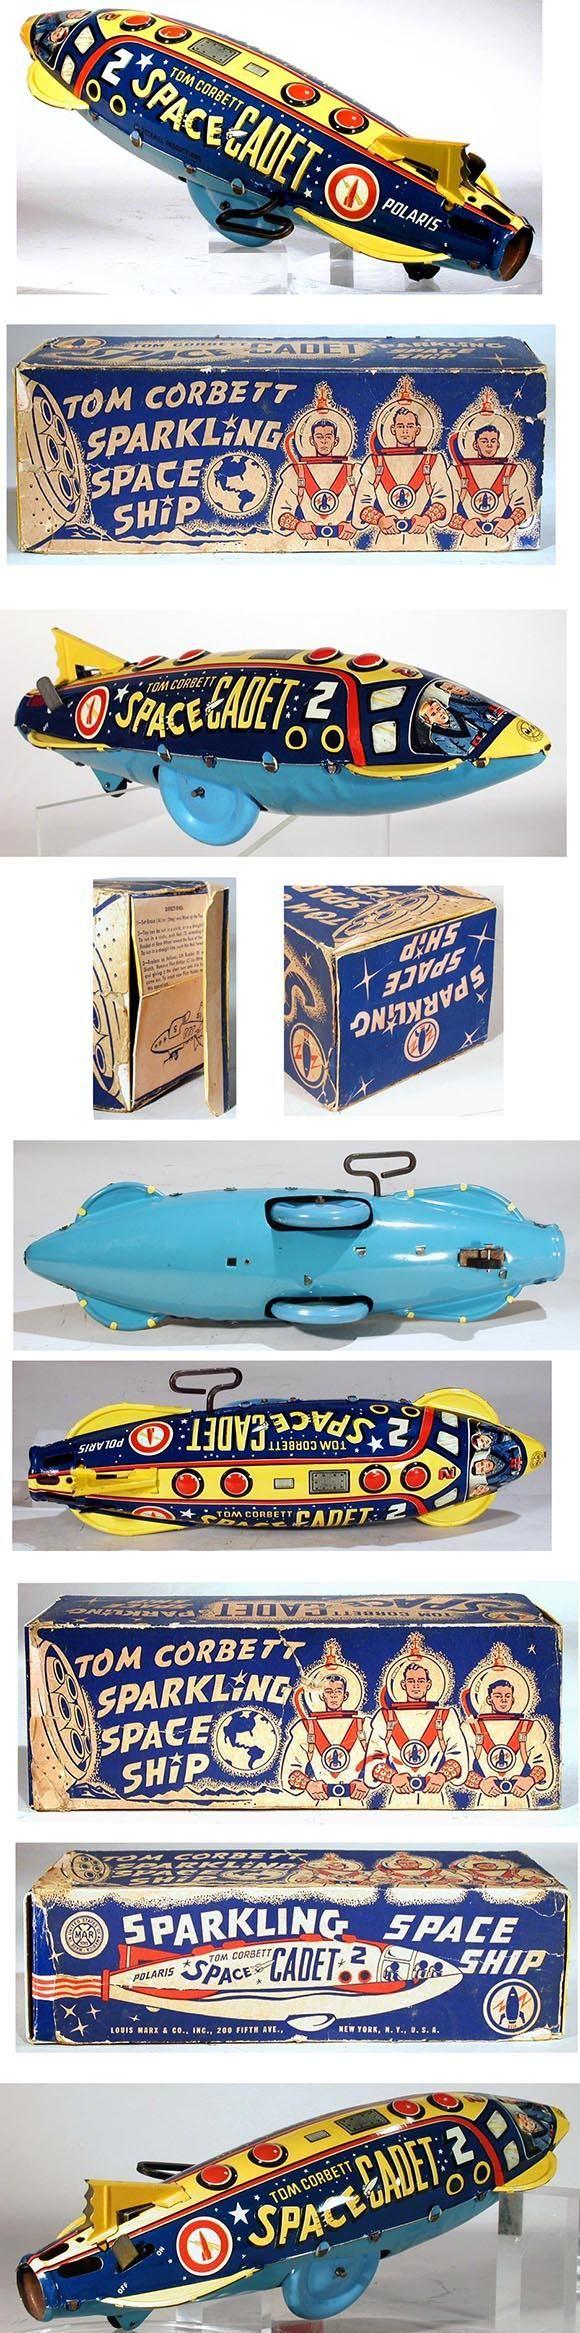 1952 Marx, Tom Corbett Polaris Space Ship in Original Box